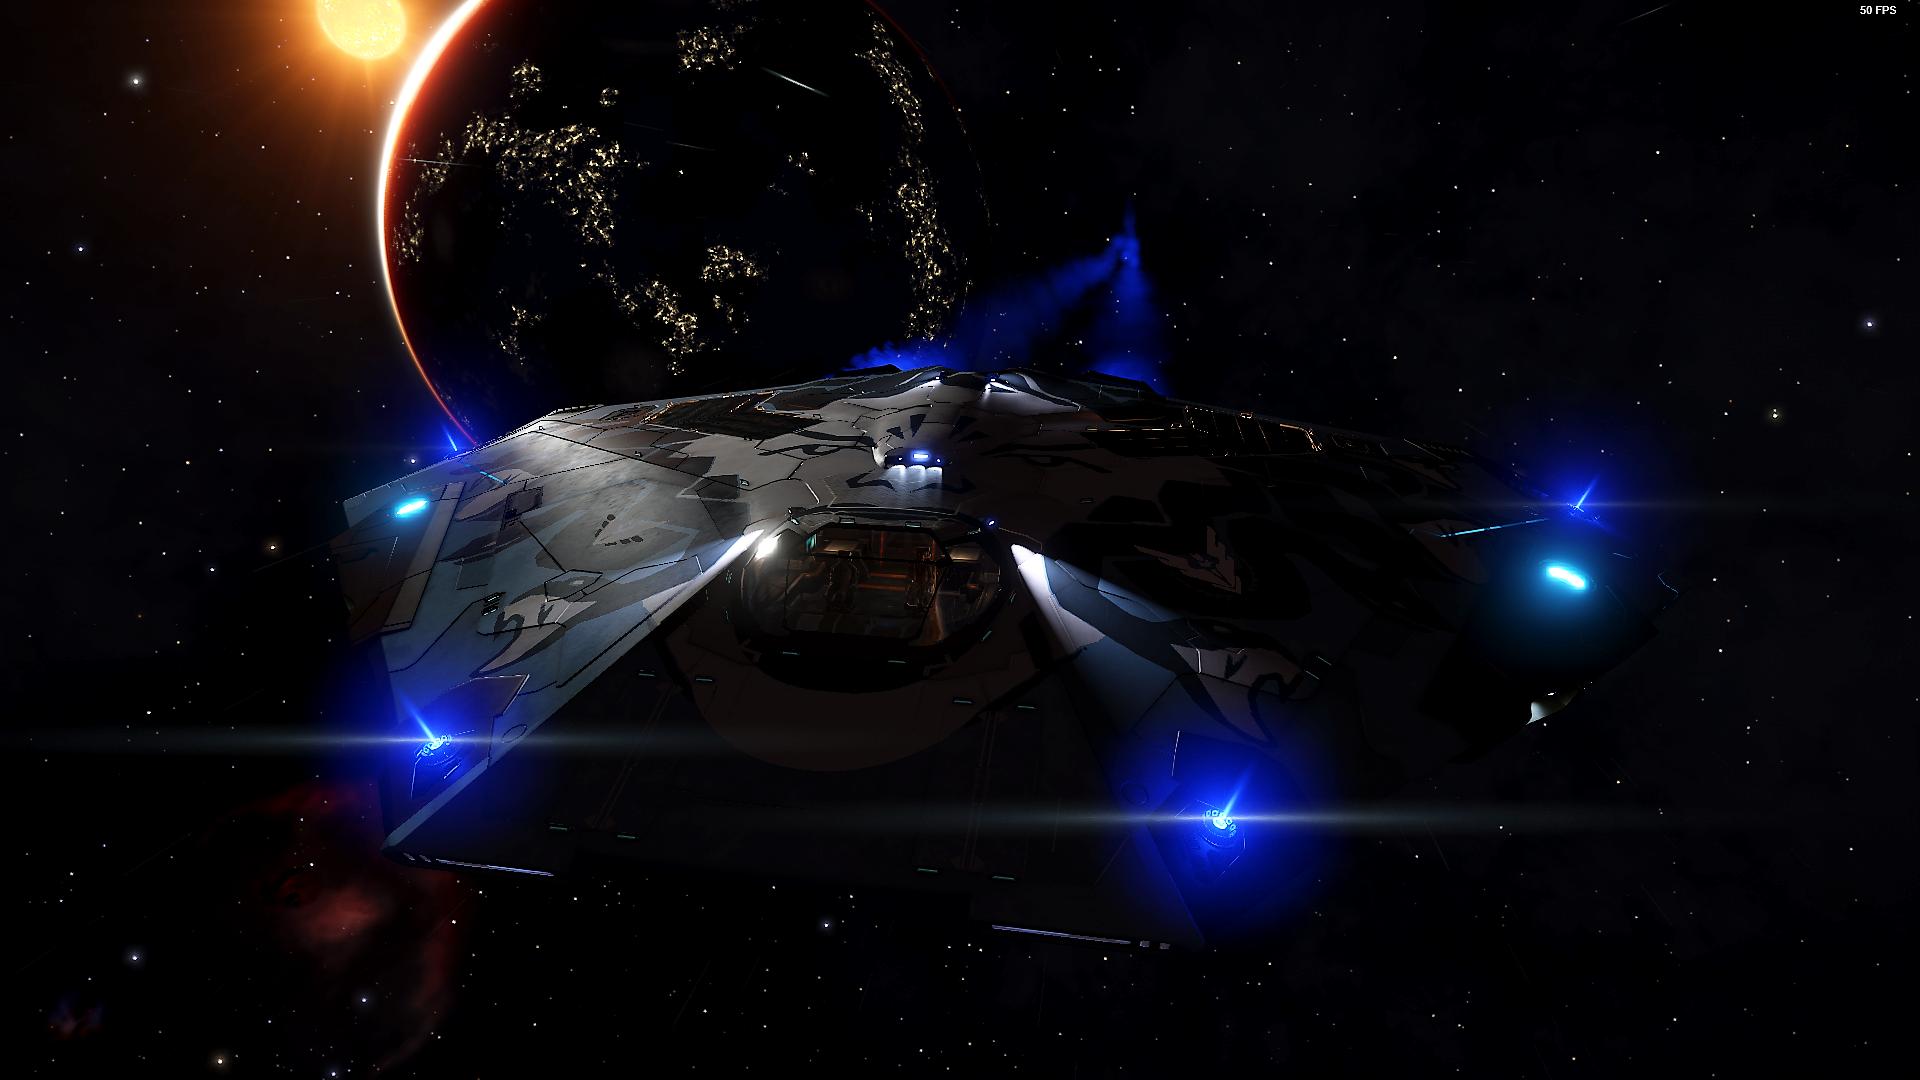 Elite Dangerous Screenshots - Ship With Fancy Thrusters